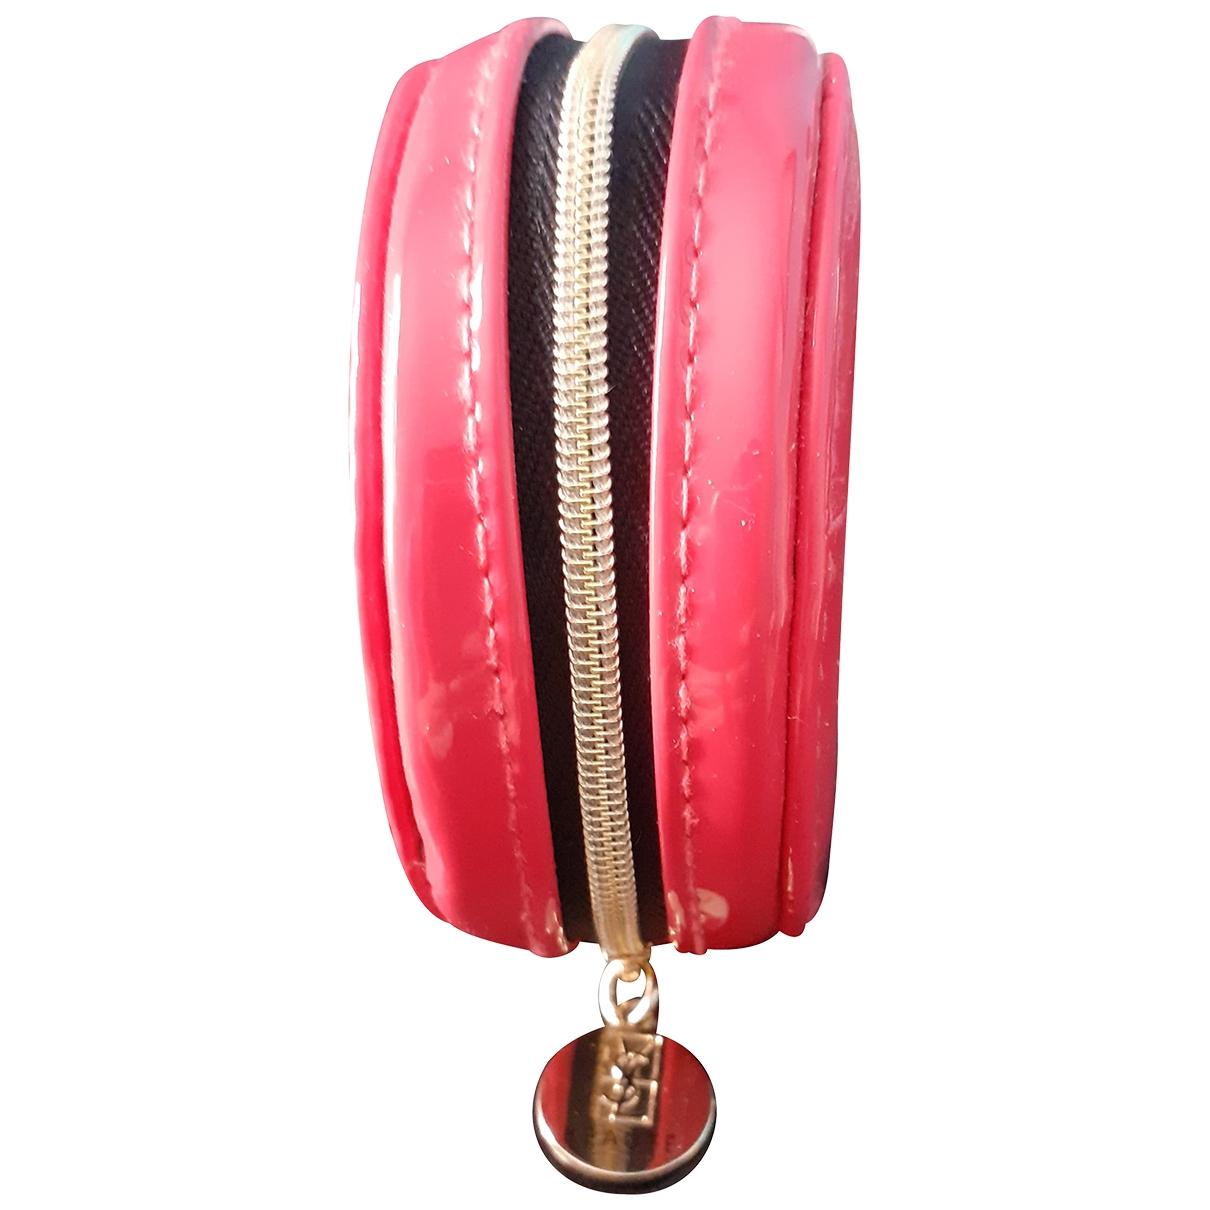 Bolsos clutch en Plastico Rosa Yves Saint Laurent